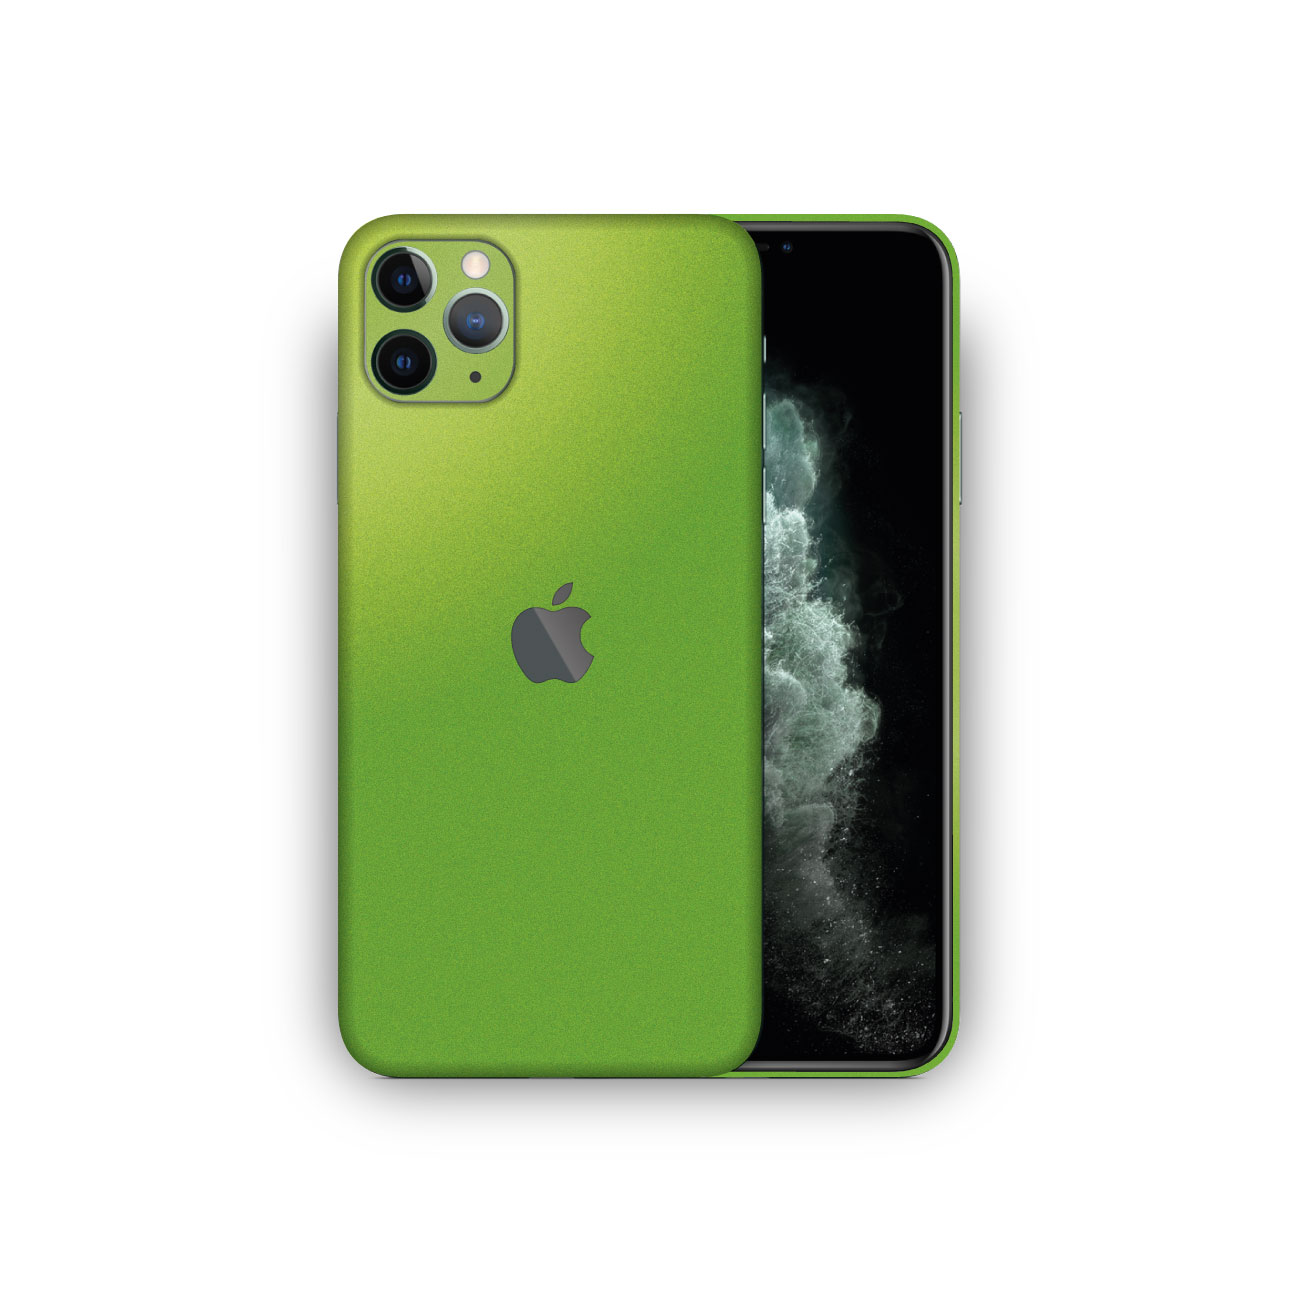 Apple iPhone 11 Pro Viper Green Metallic Matte Vinyl Skin Wrap